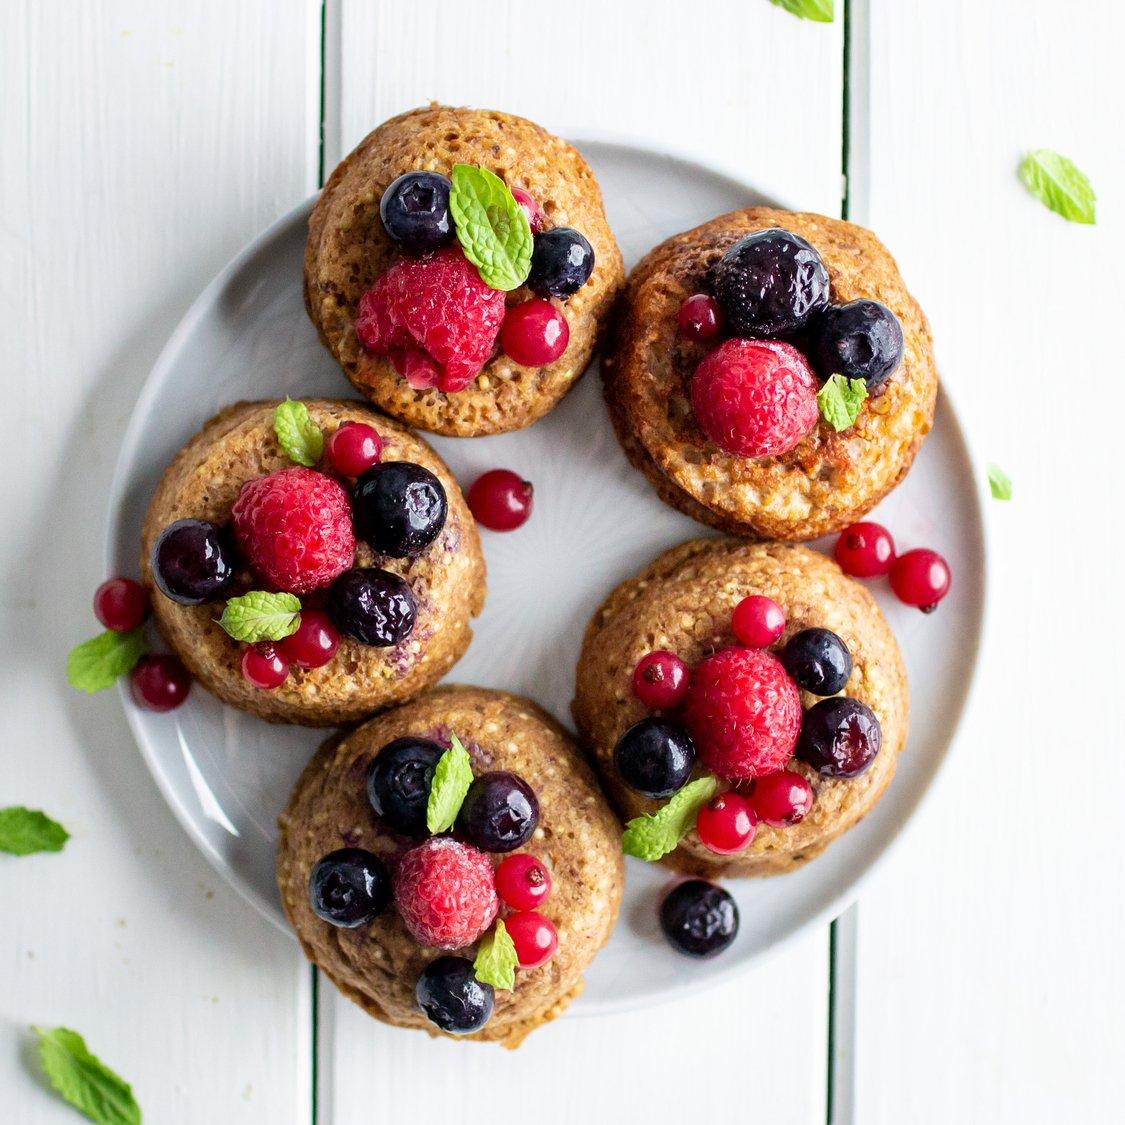 Hirse-Walnuss-Muffins